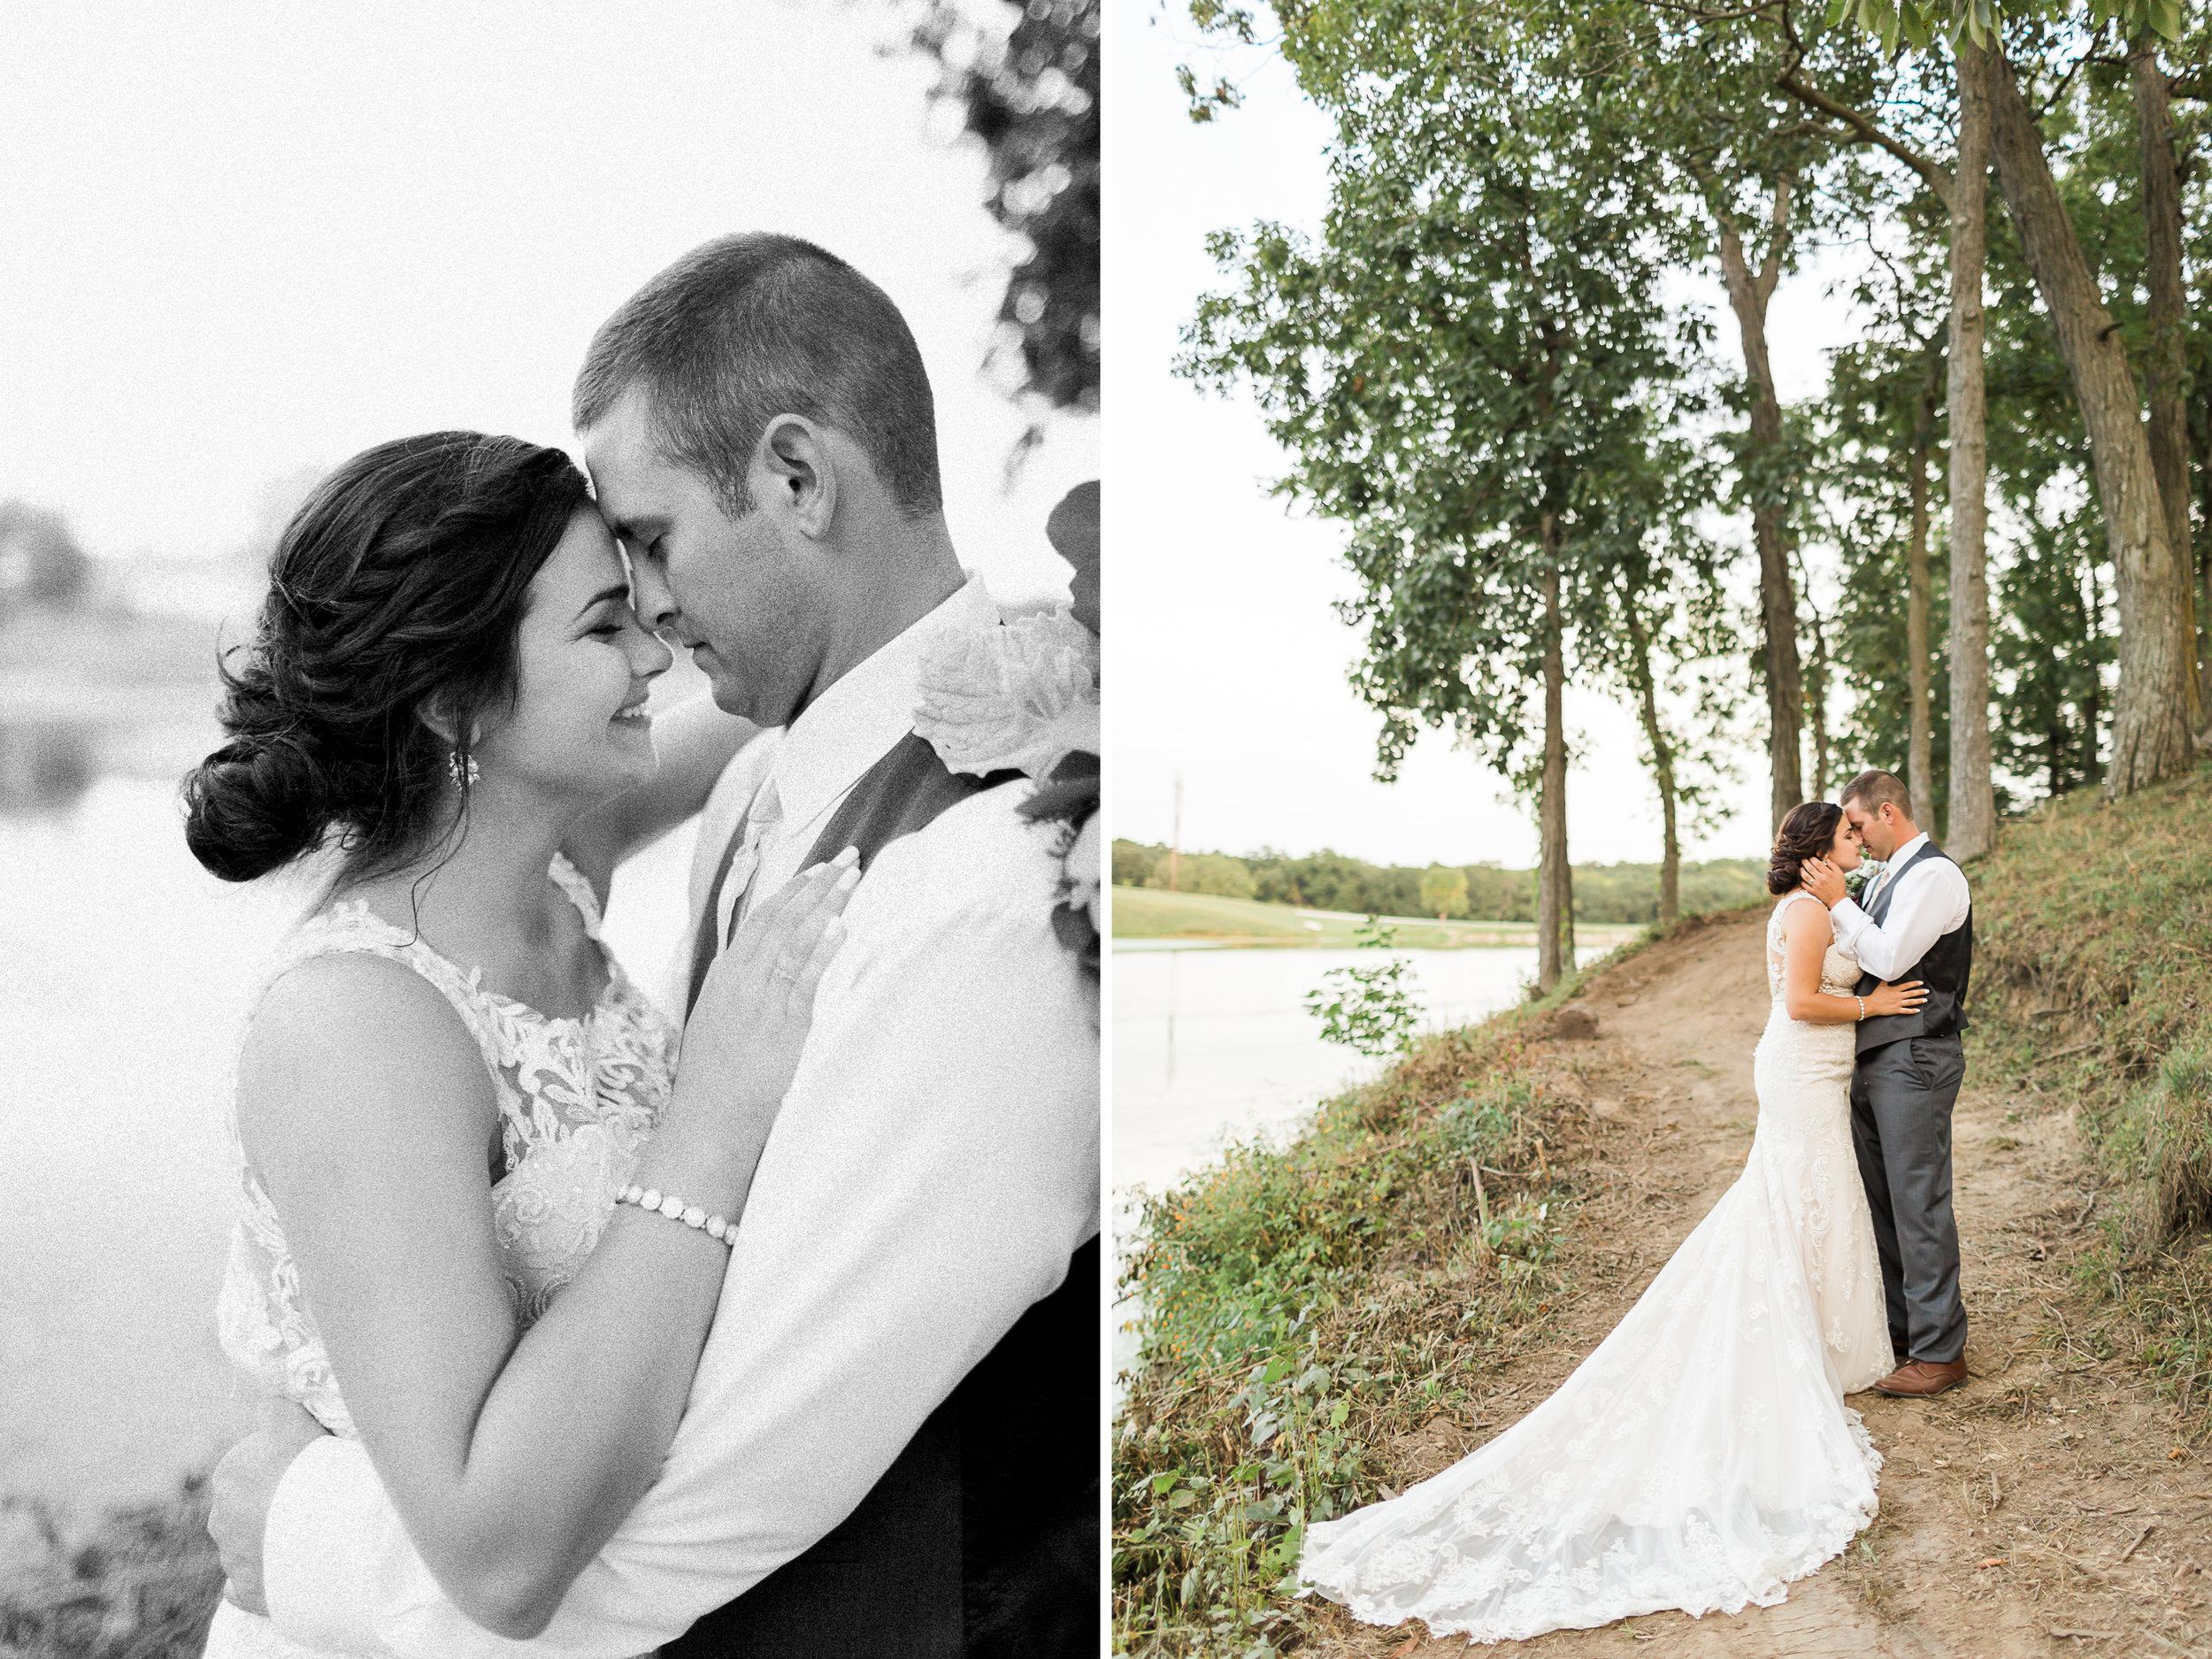 romanticcountrywedding-20.jpg